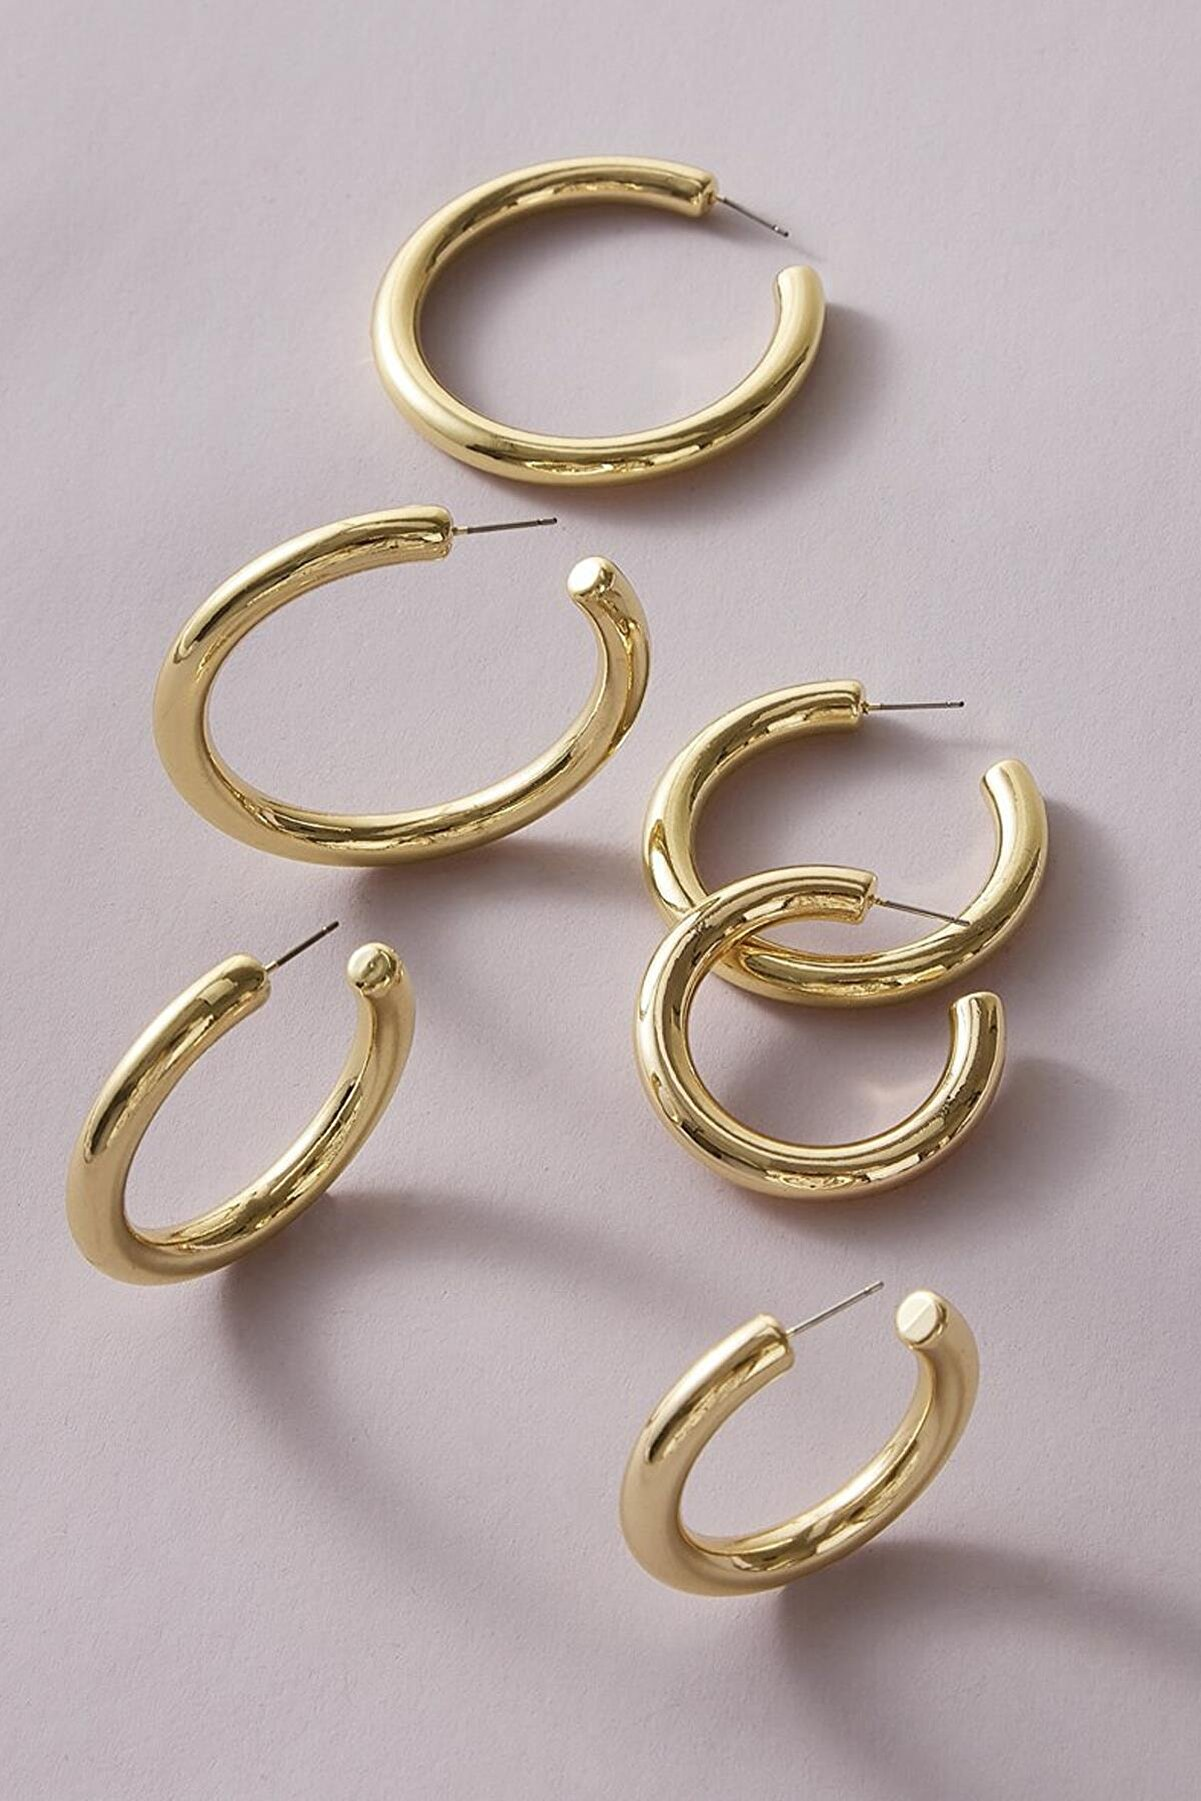 New Obsessions Kadın Altın Renk Kalın Halka Küpe 3'lü Set